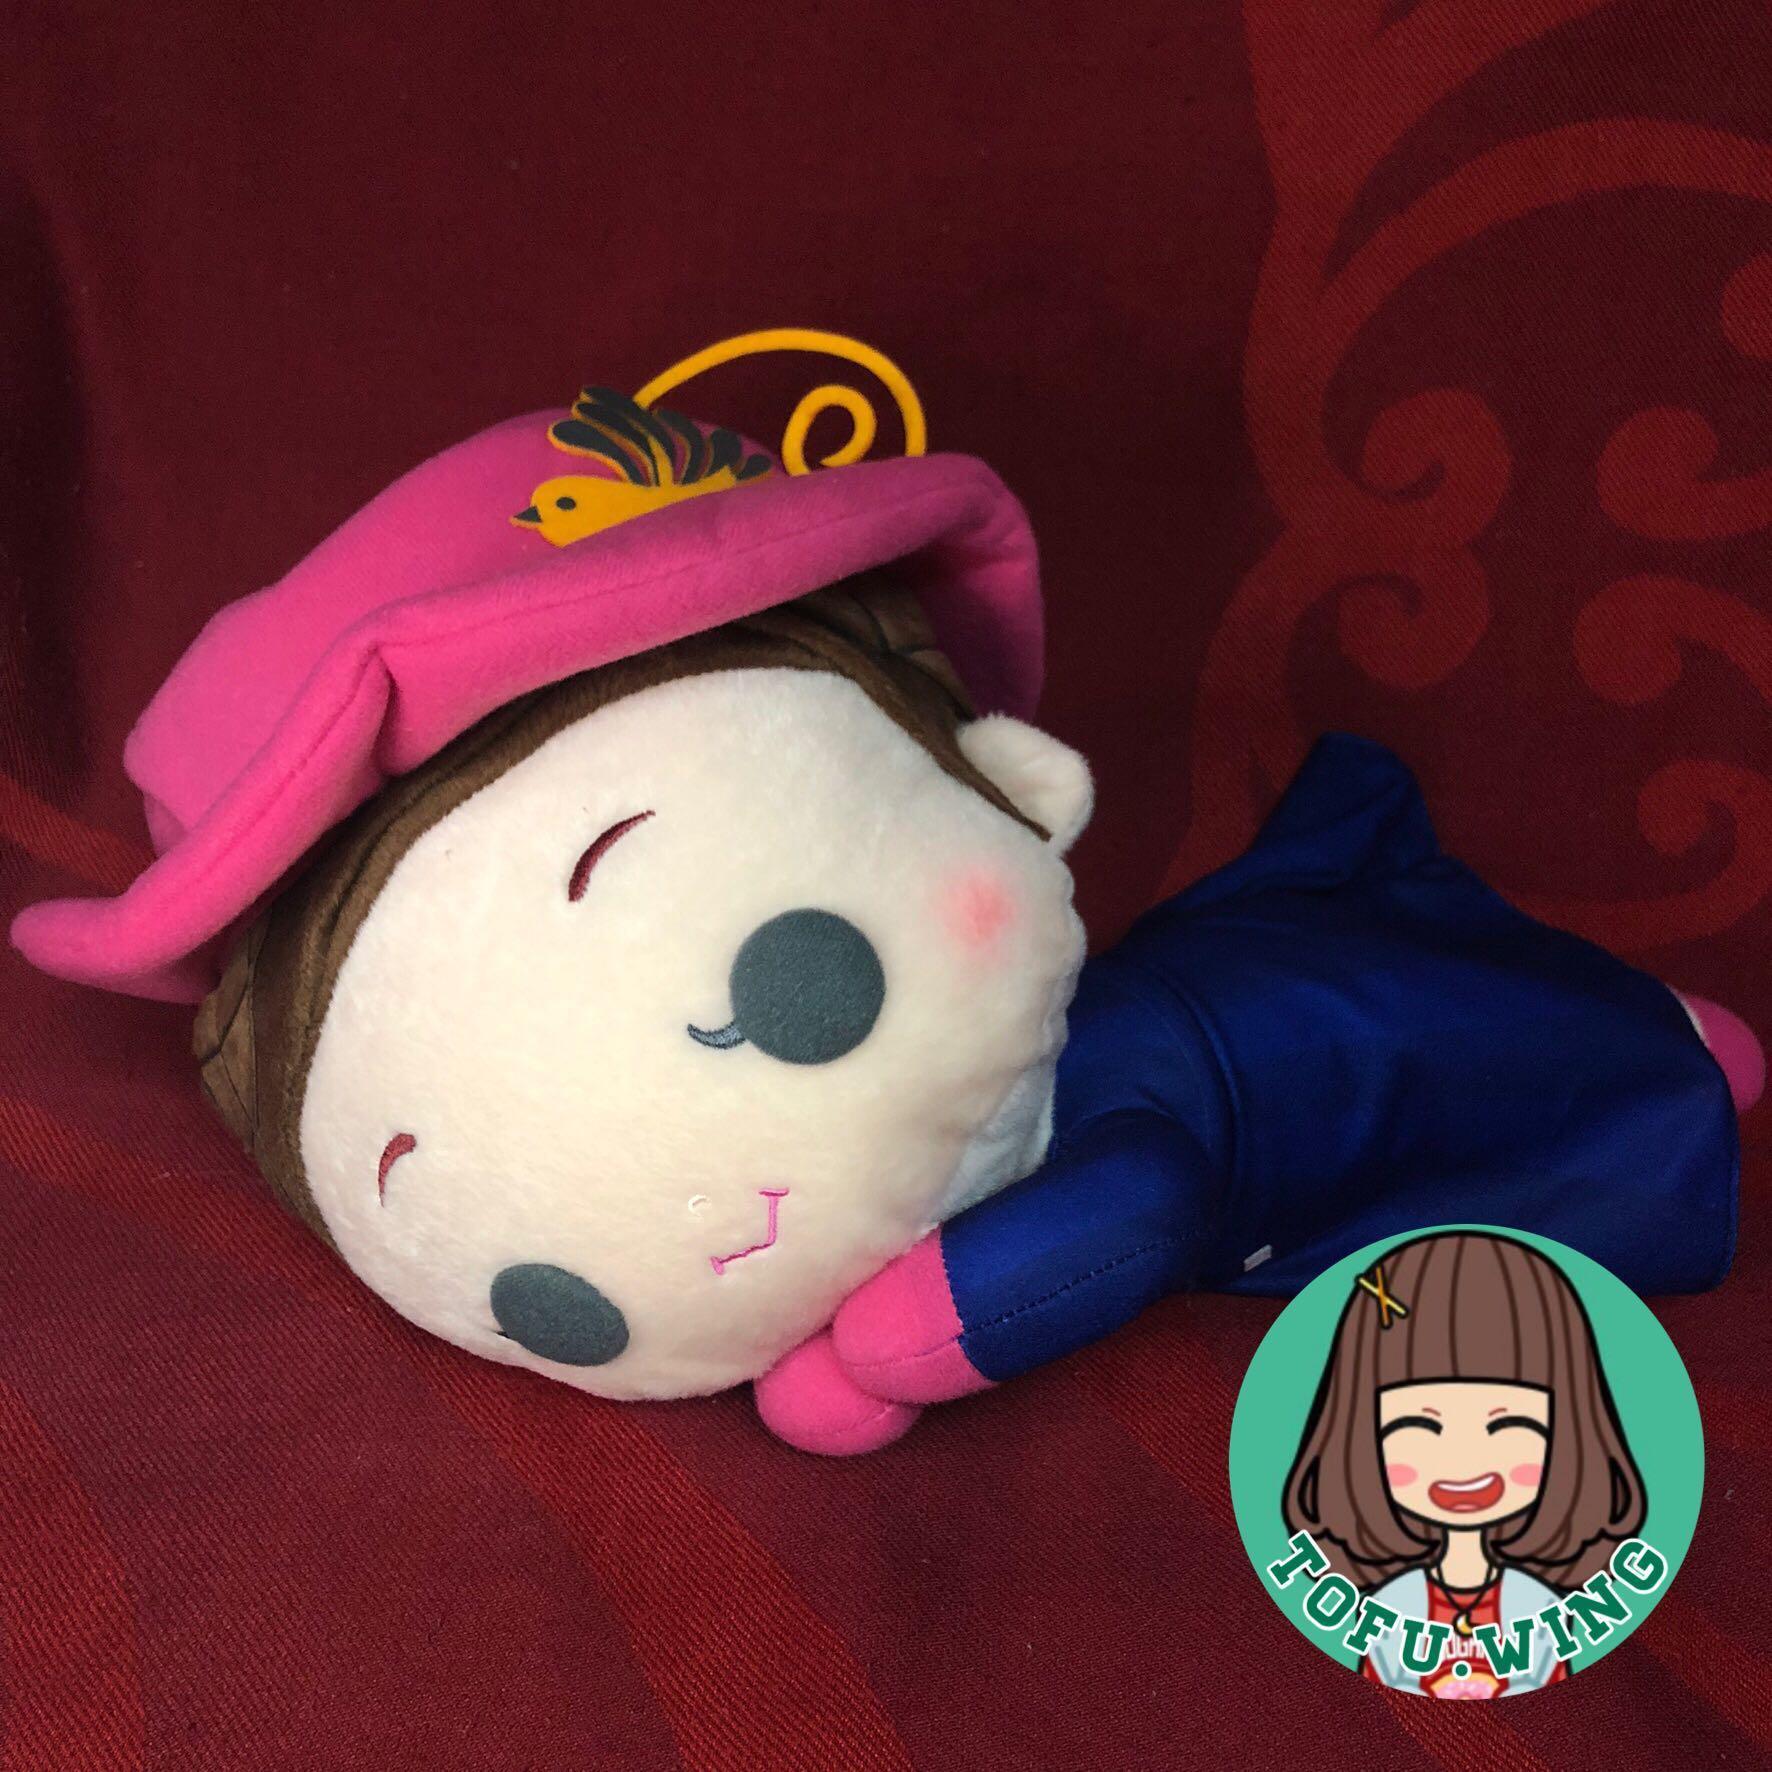 SEGA Mary Poppins Returns Dreamy SP stuffed toy Soft plush Mary Poppins pink